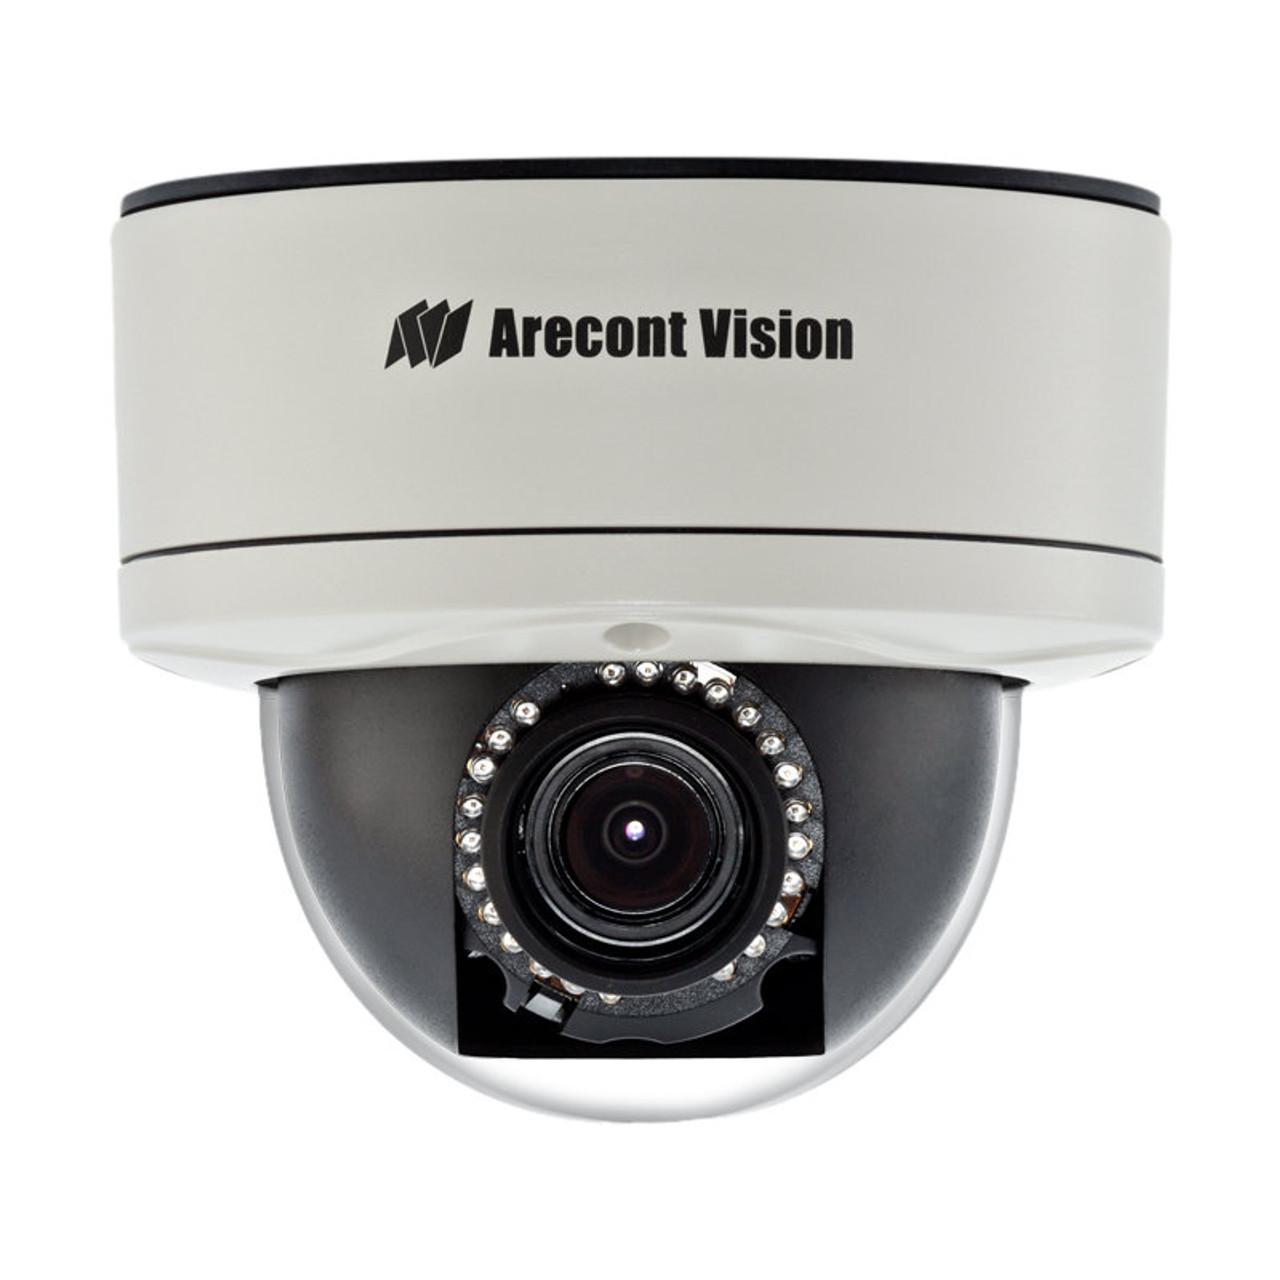 ARECONT VISION AV2555DN-S IP CAMERA DRIVER PC